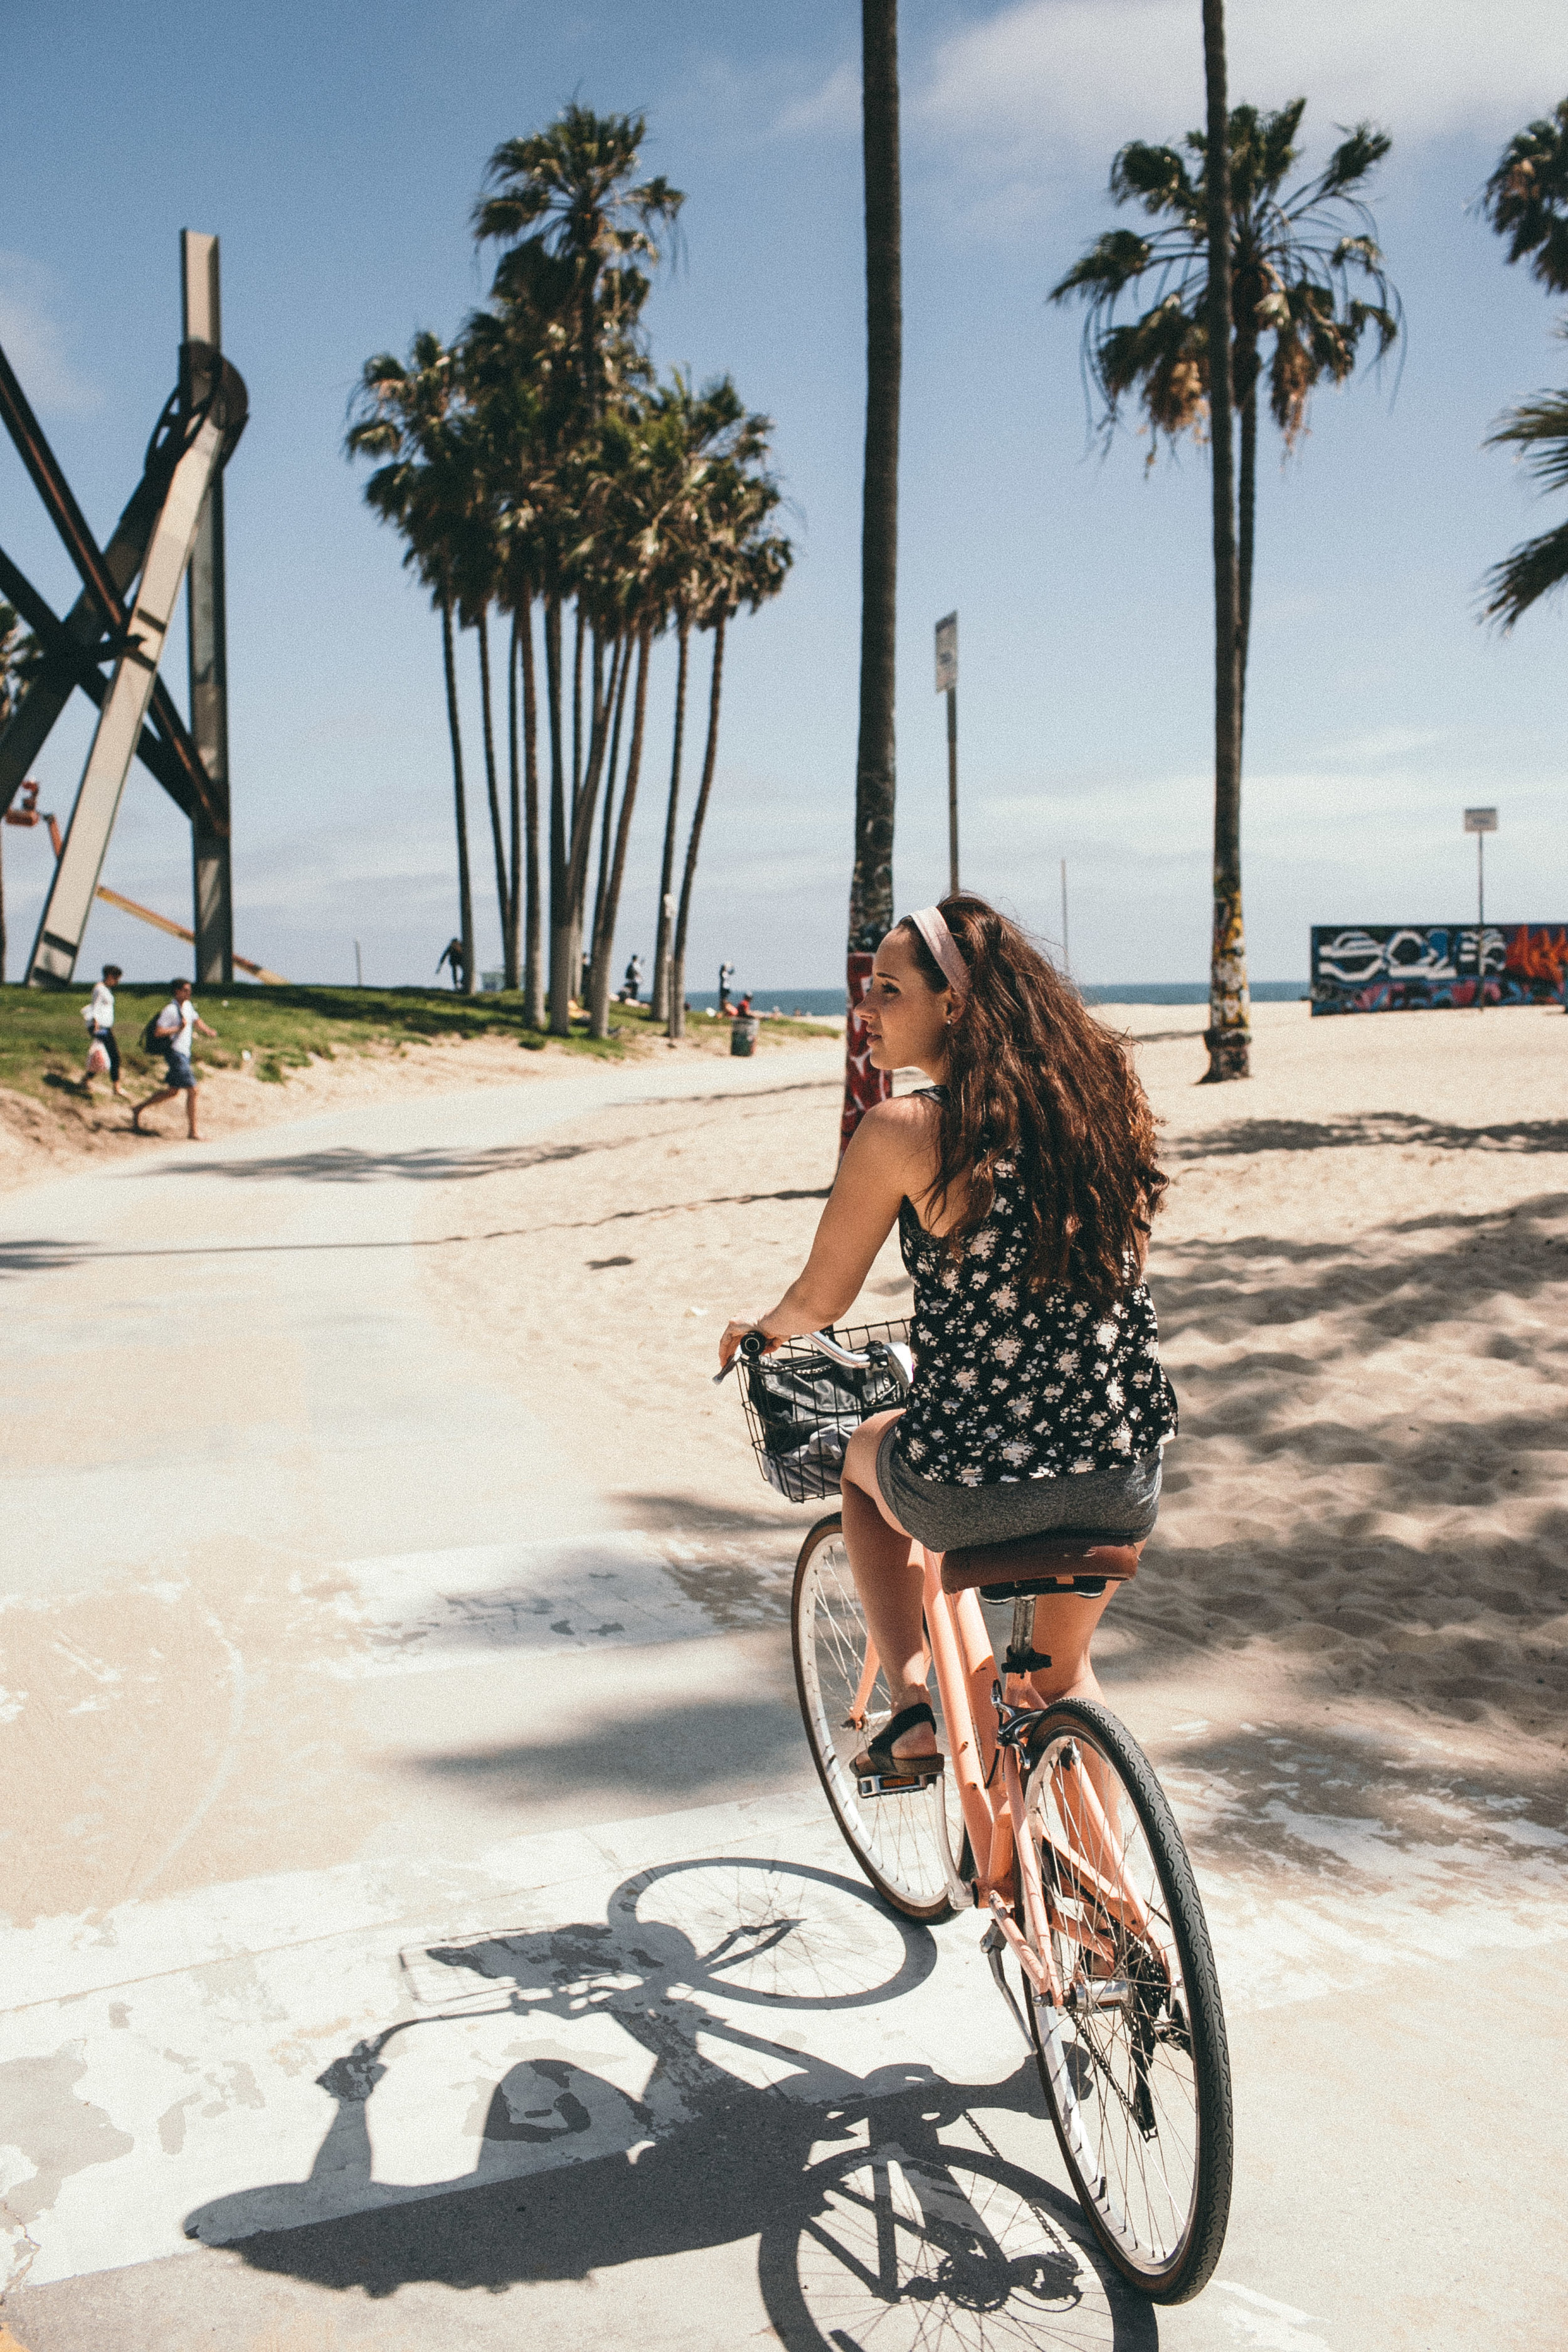 Bike Ride in Venice Beach - Venice Boardwalk